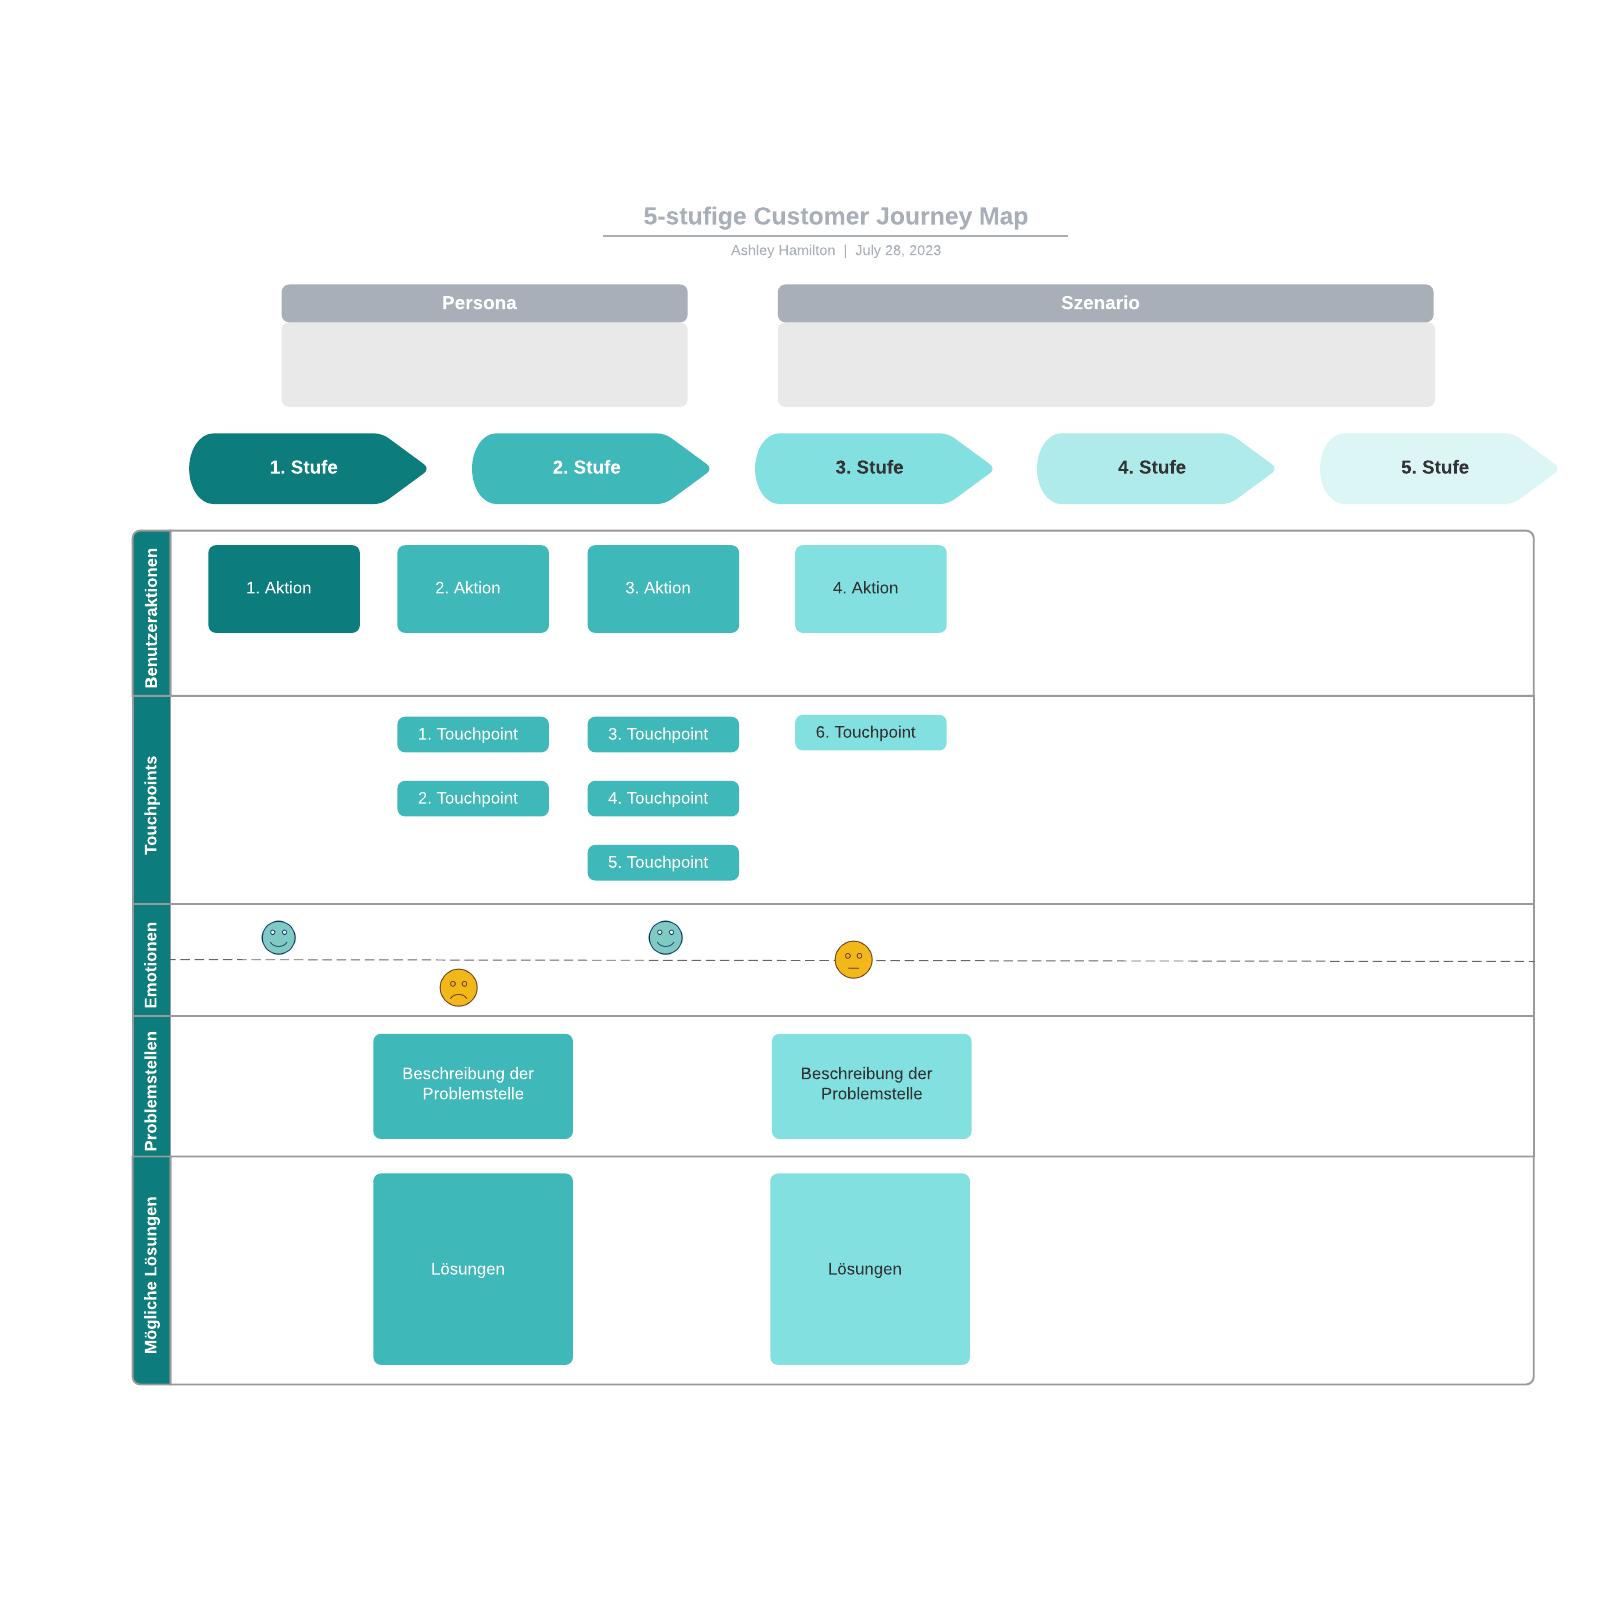 5-stufige Customer Journey Map Vorlage